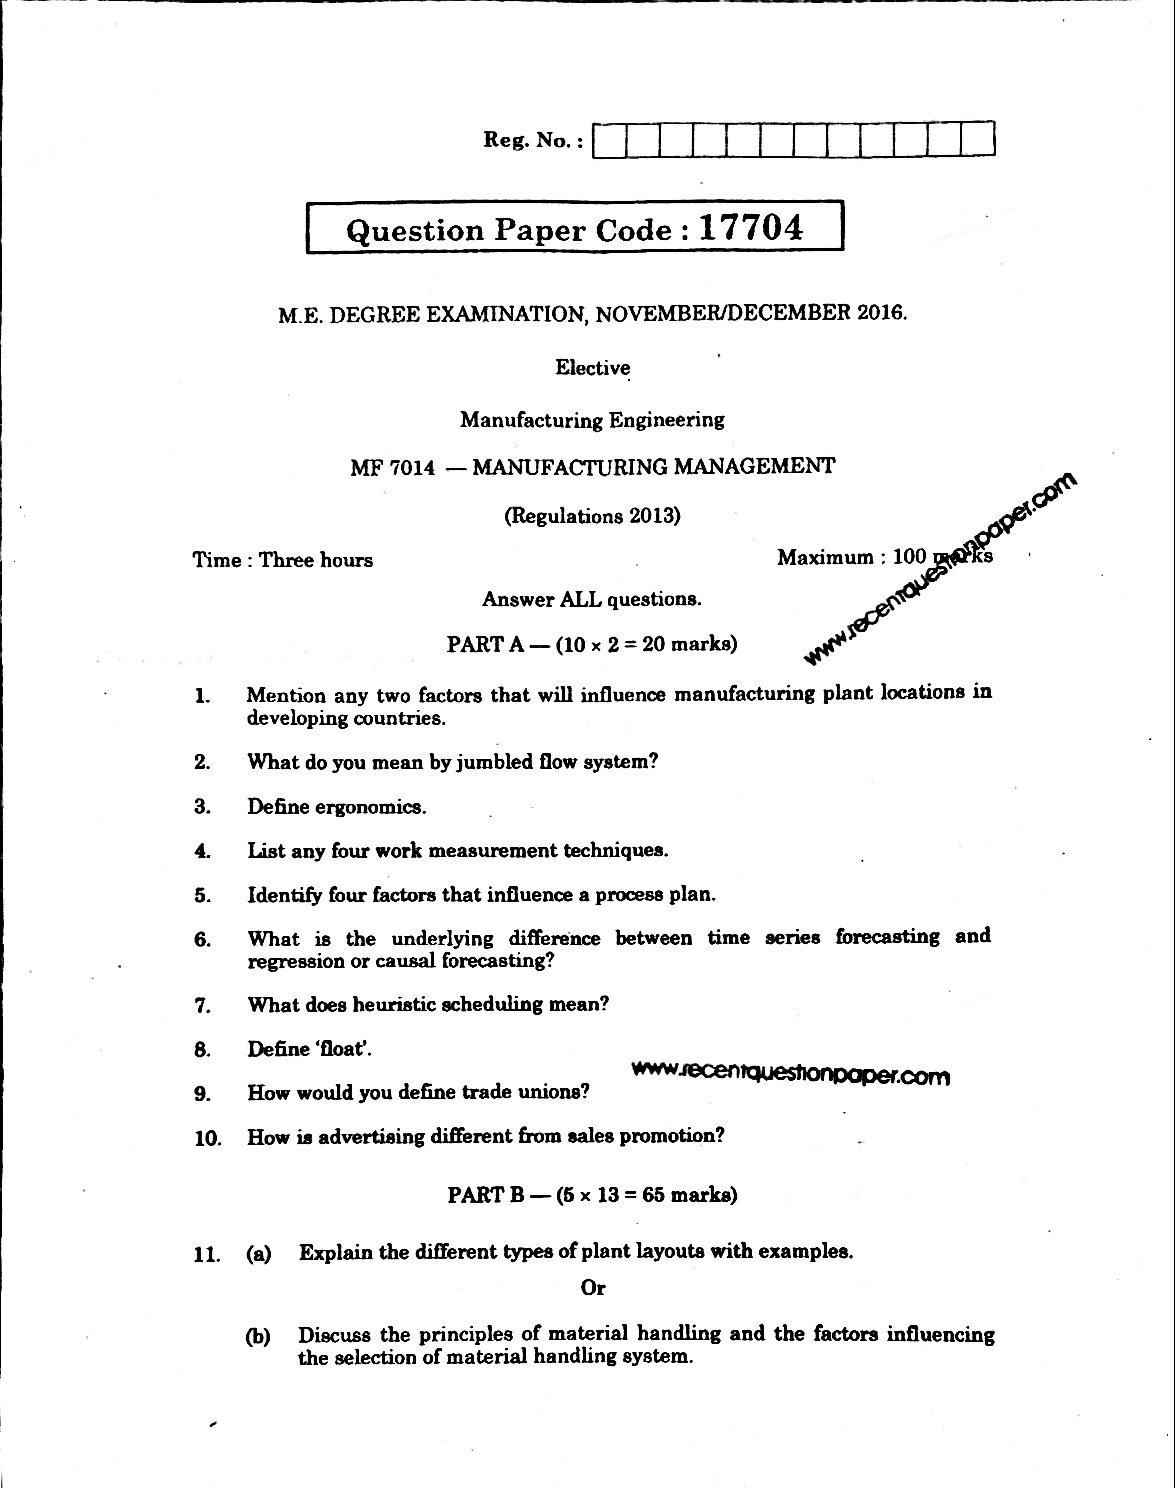 MF7014 Manafacturing Management Anna University Question paper Nov/Dec 2016